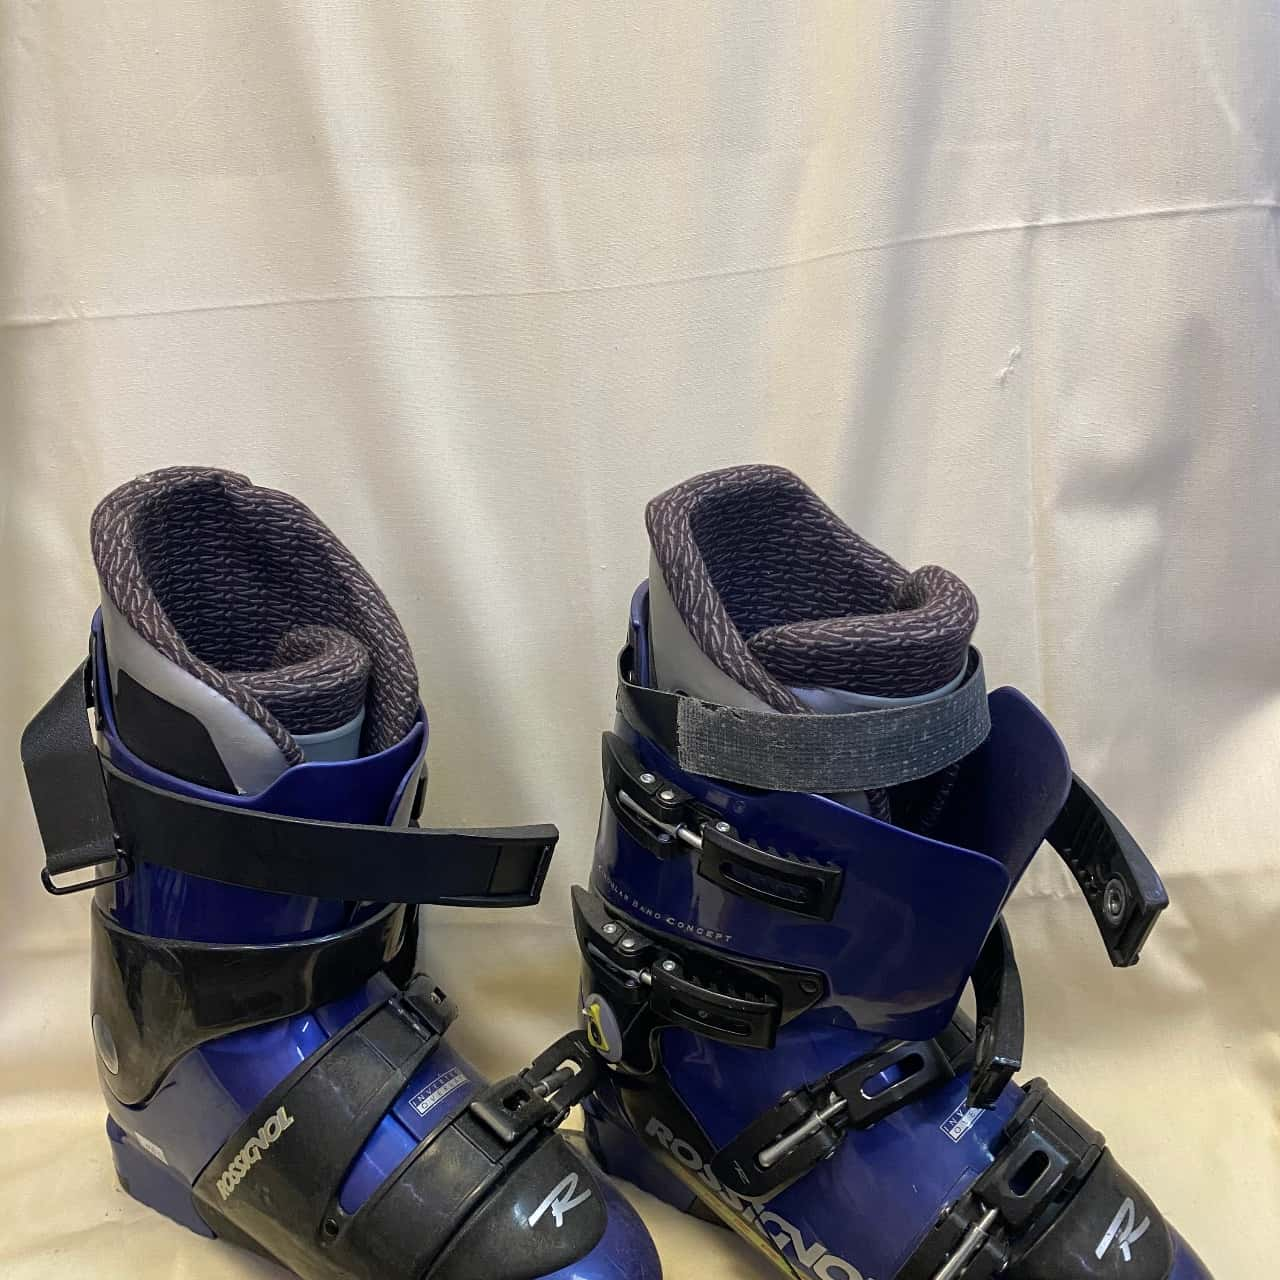 Rossignol Energy ST Unisex Ski Boots Size 27.5 (9.5M/9.5F) Blue